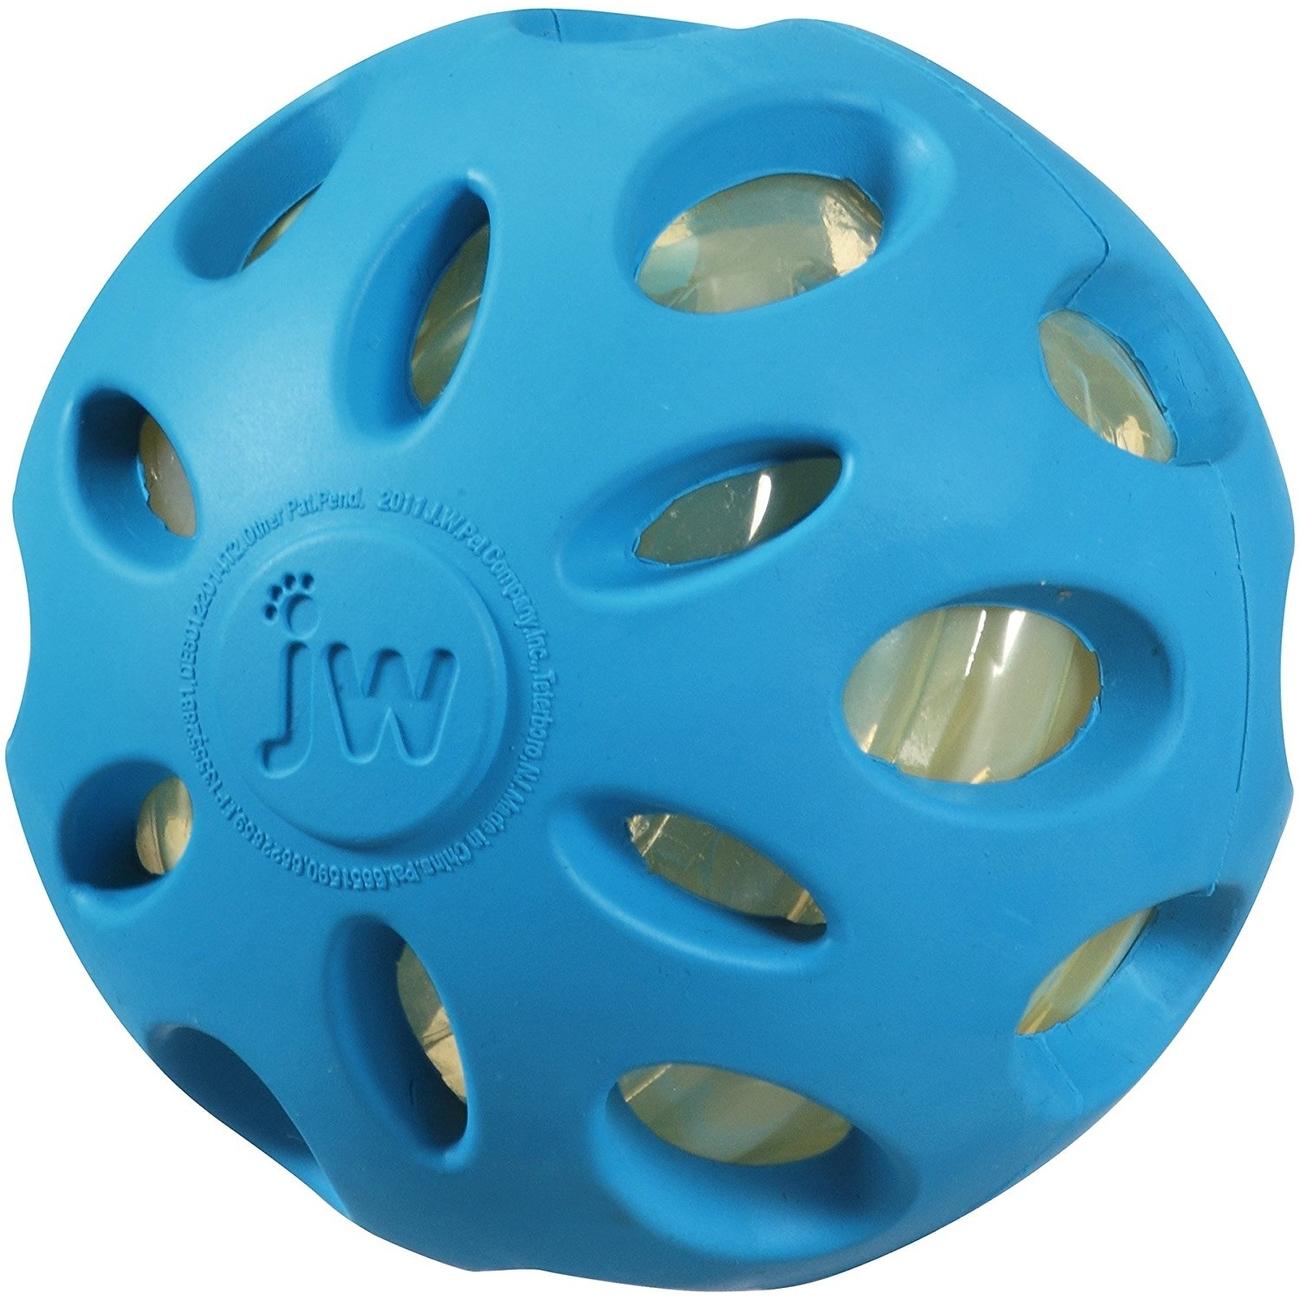 JW Pet Crackle Ball Hundespielzeug, Bild 2